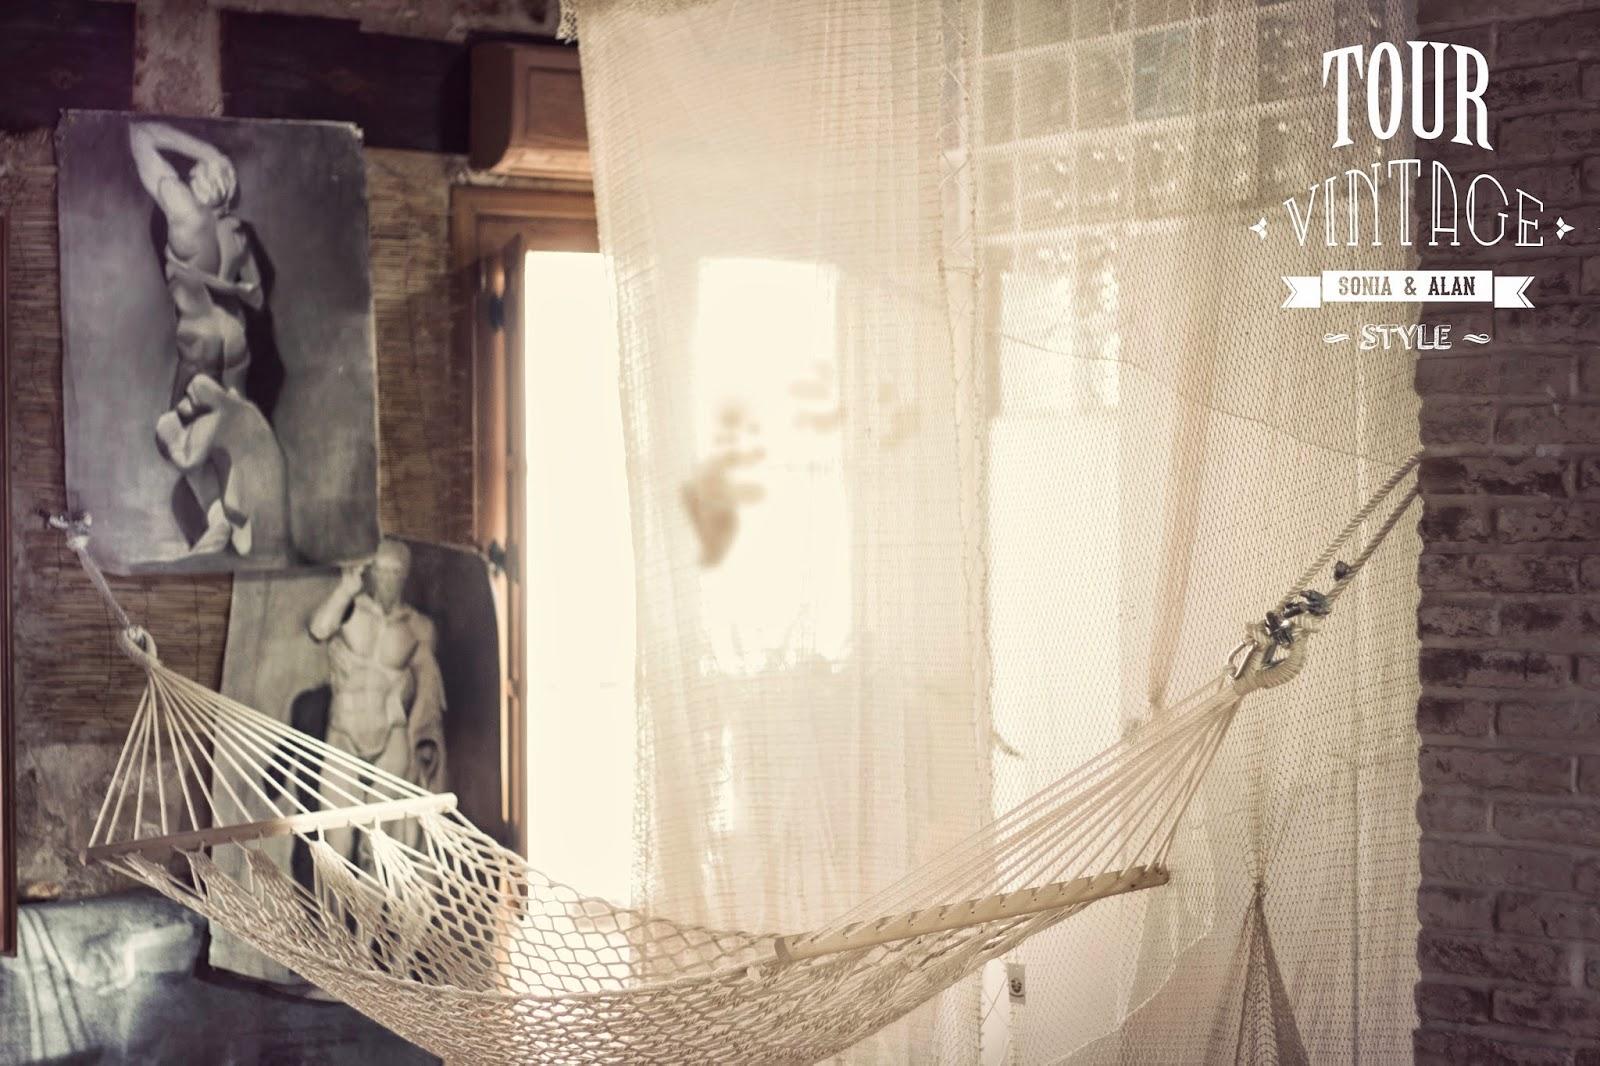 Casa rural la pintora Requena. Hamaca. Alan Blesa y Sonia Soler. tourvintage.blogspot.com